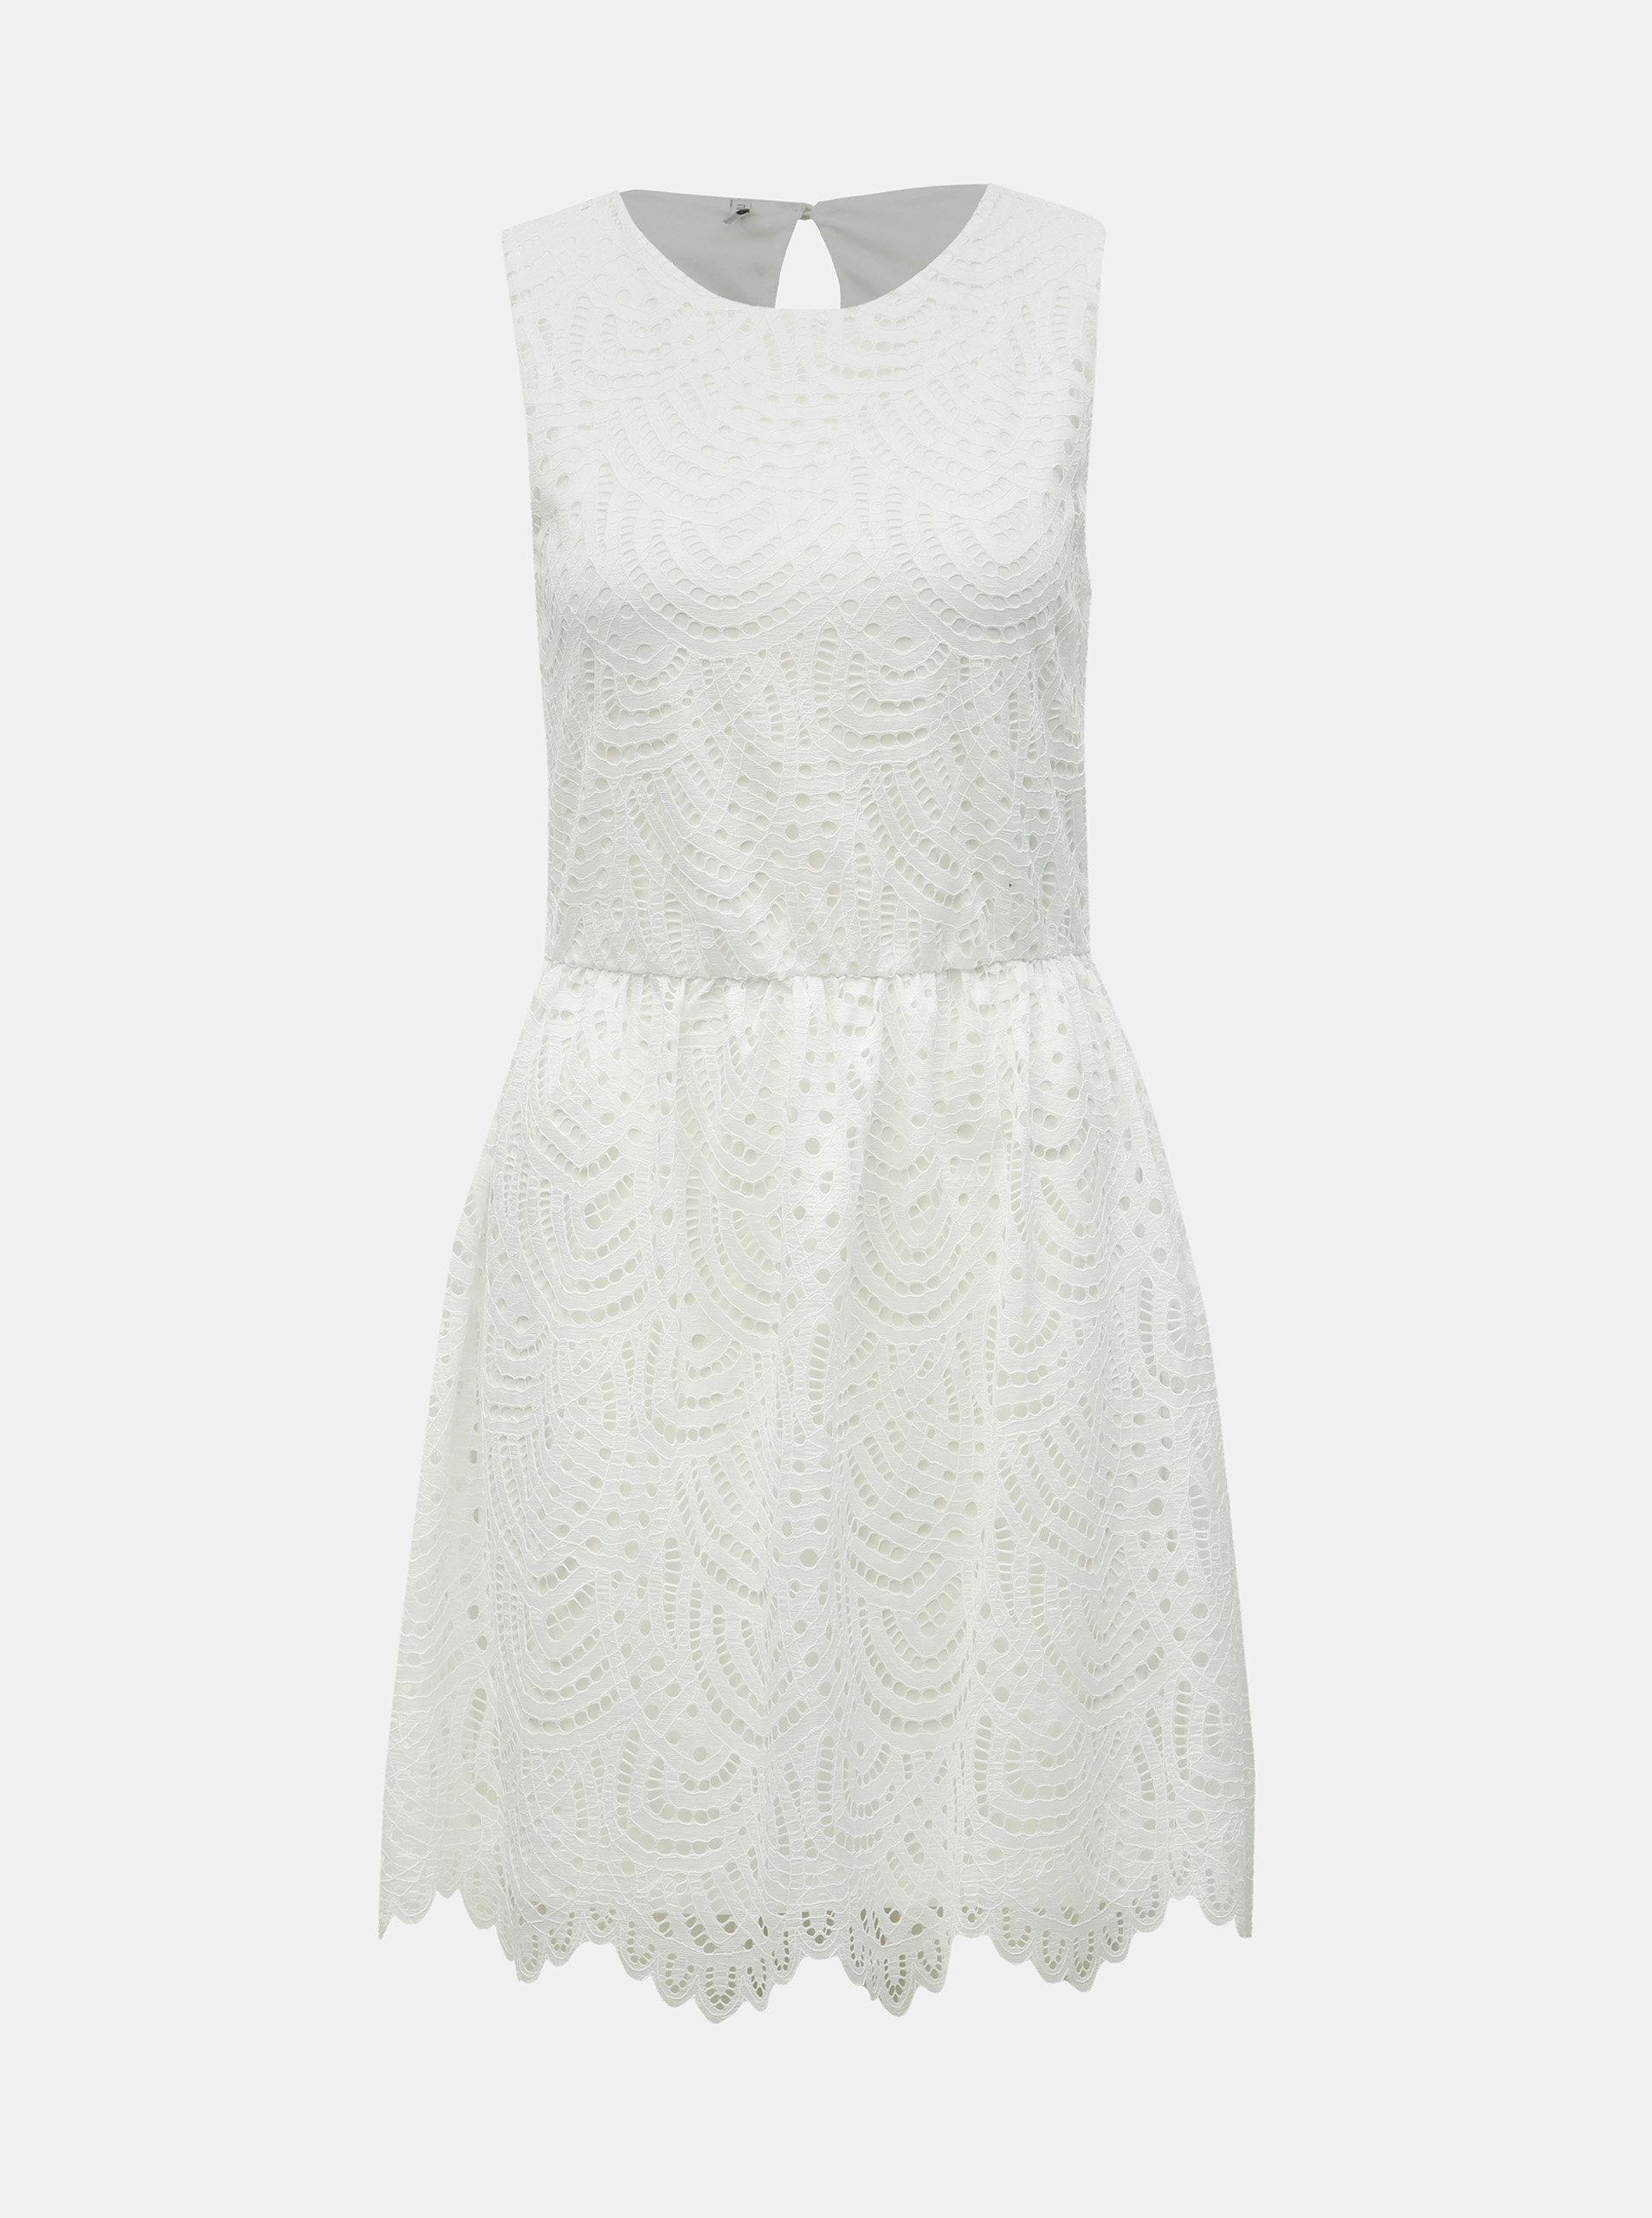 5c4211db1817 Biele čipkované šaty ONLY Edith ...